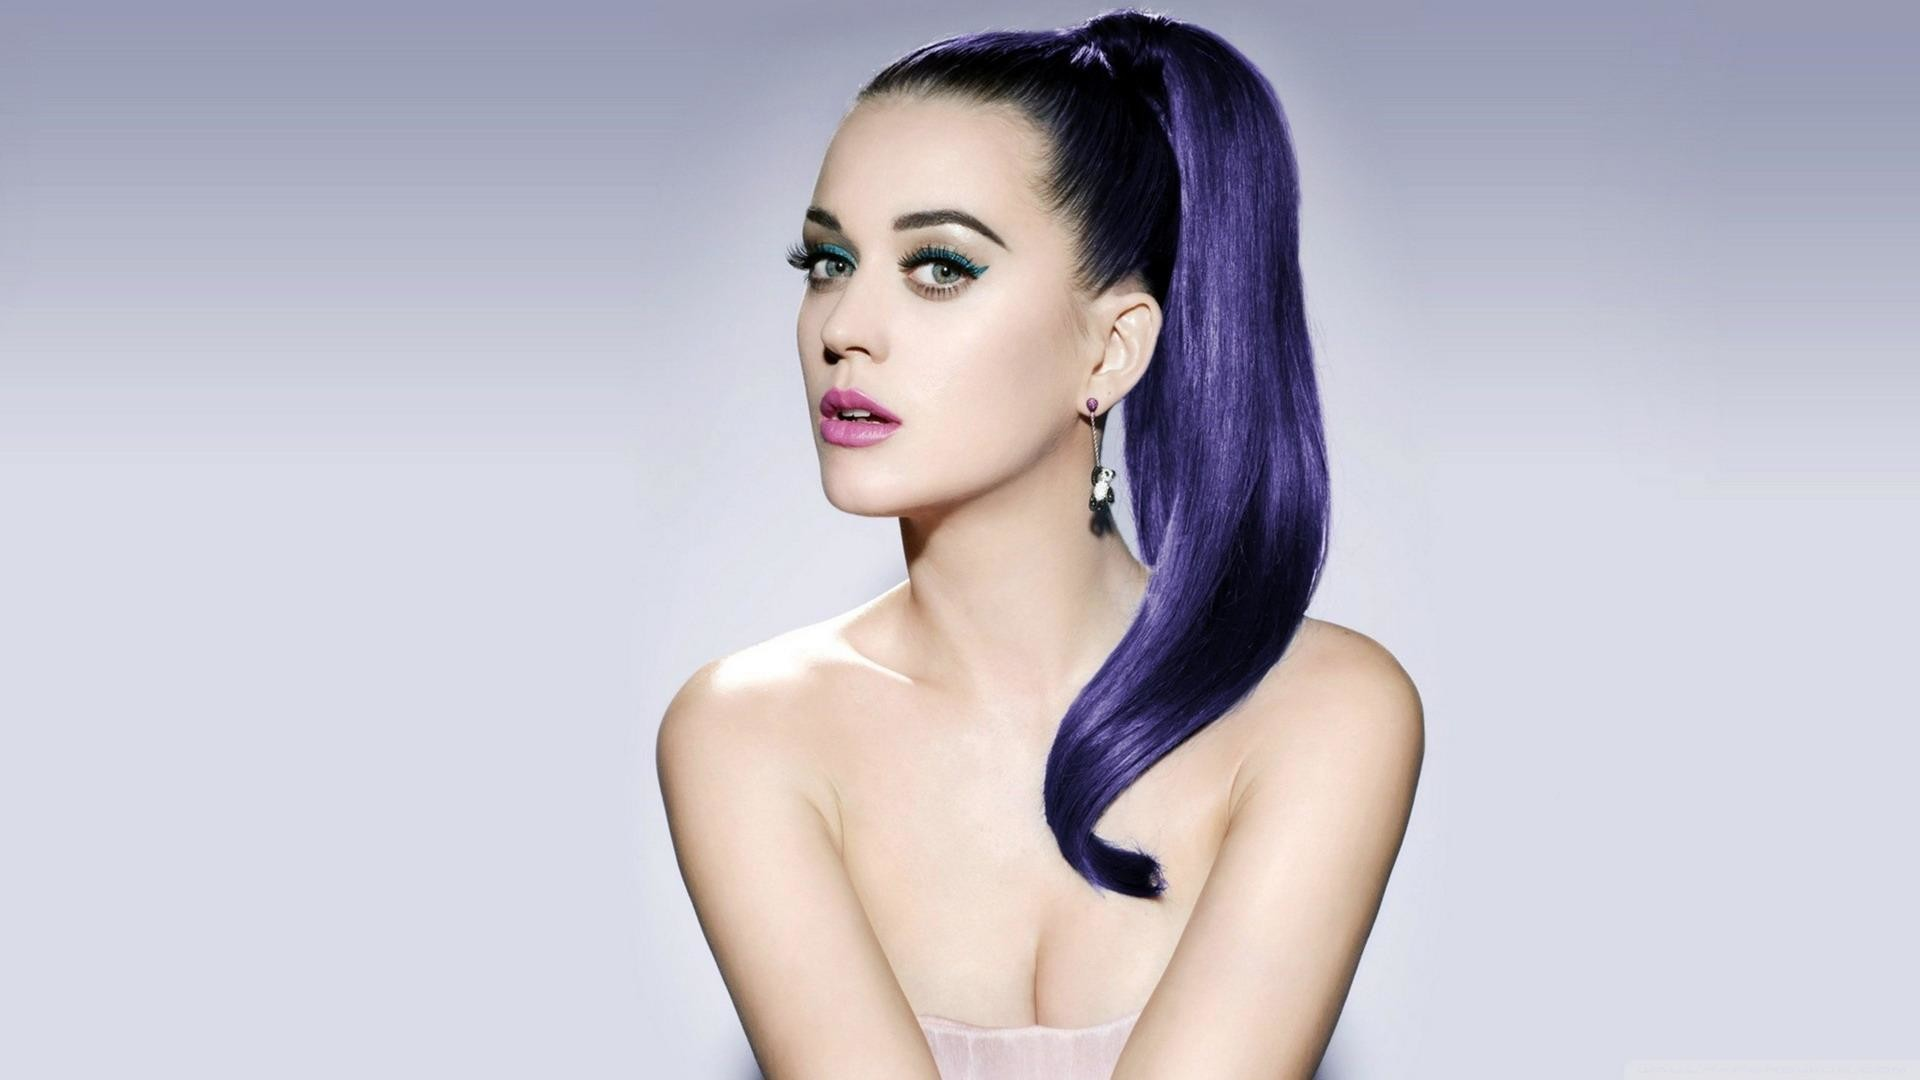 Katy Perry 2013 wallpaper 229281